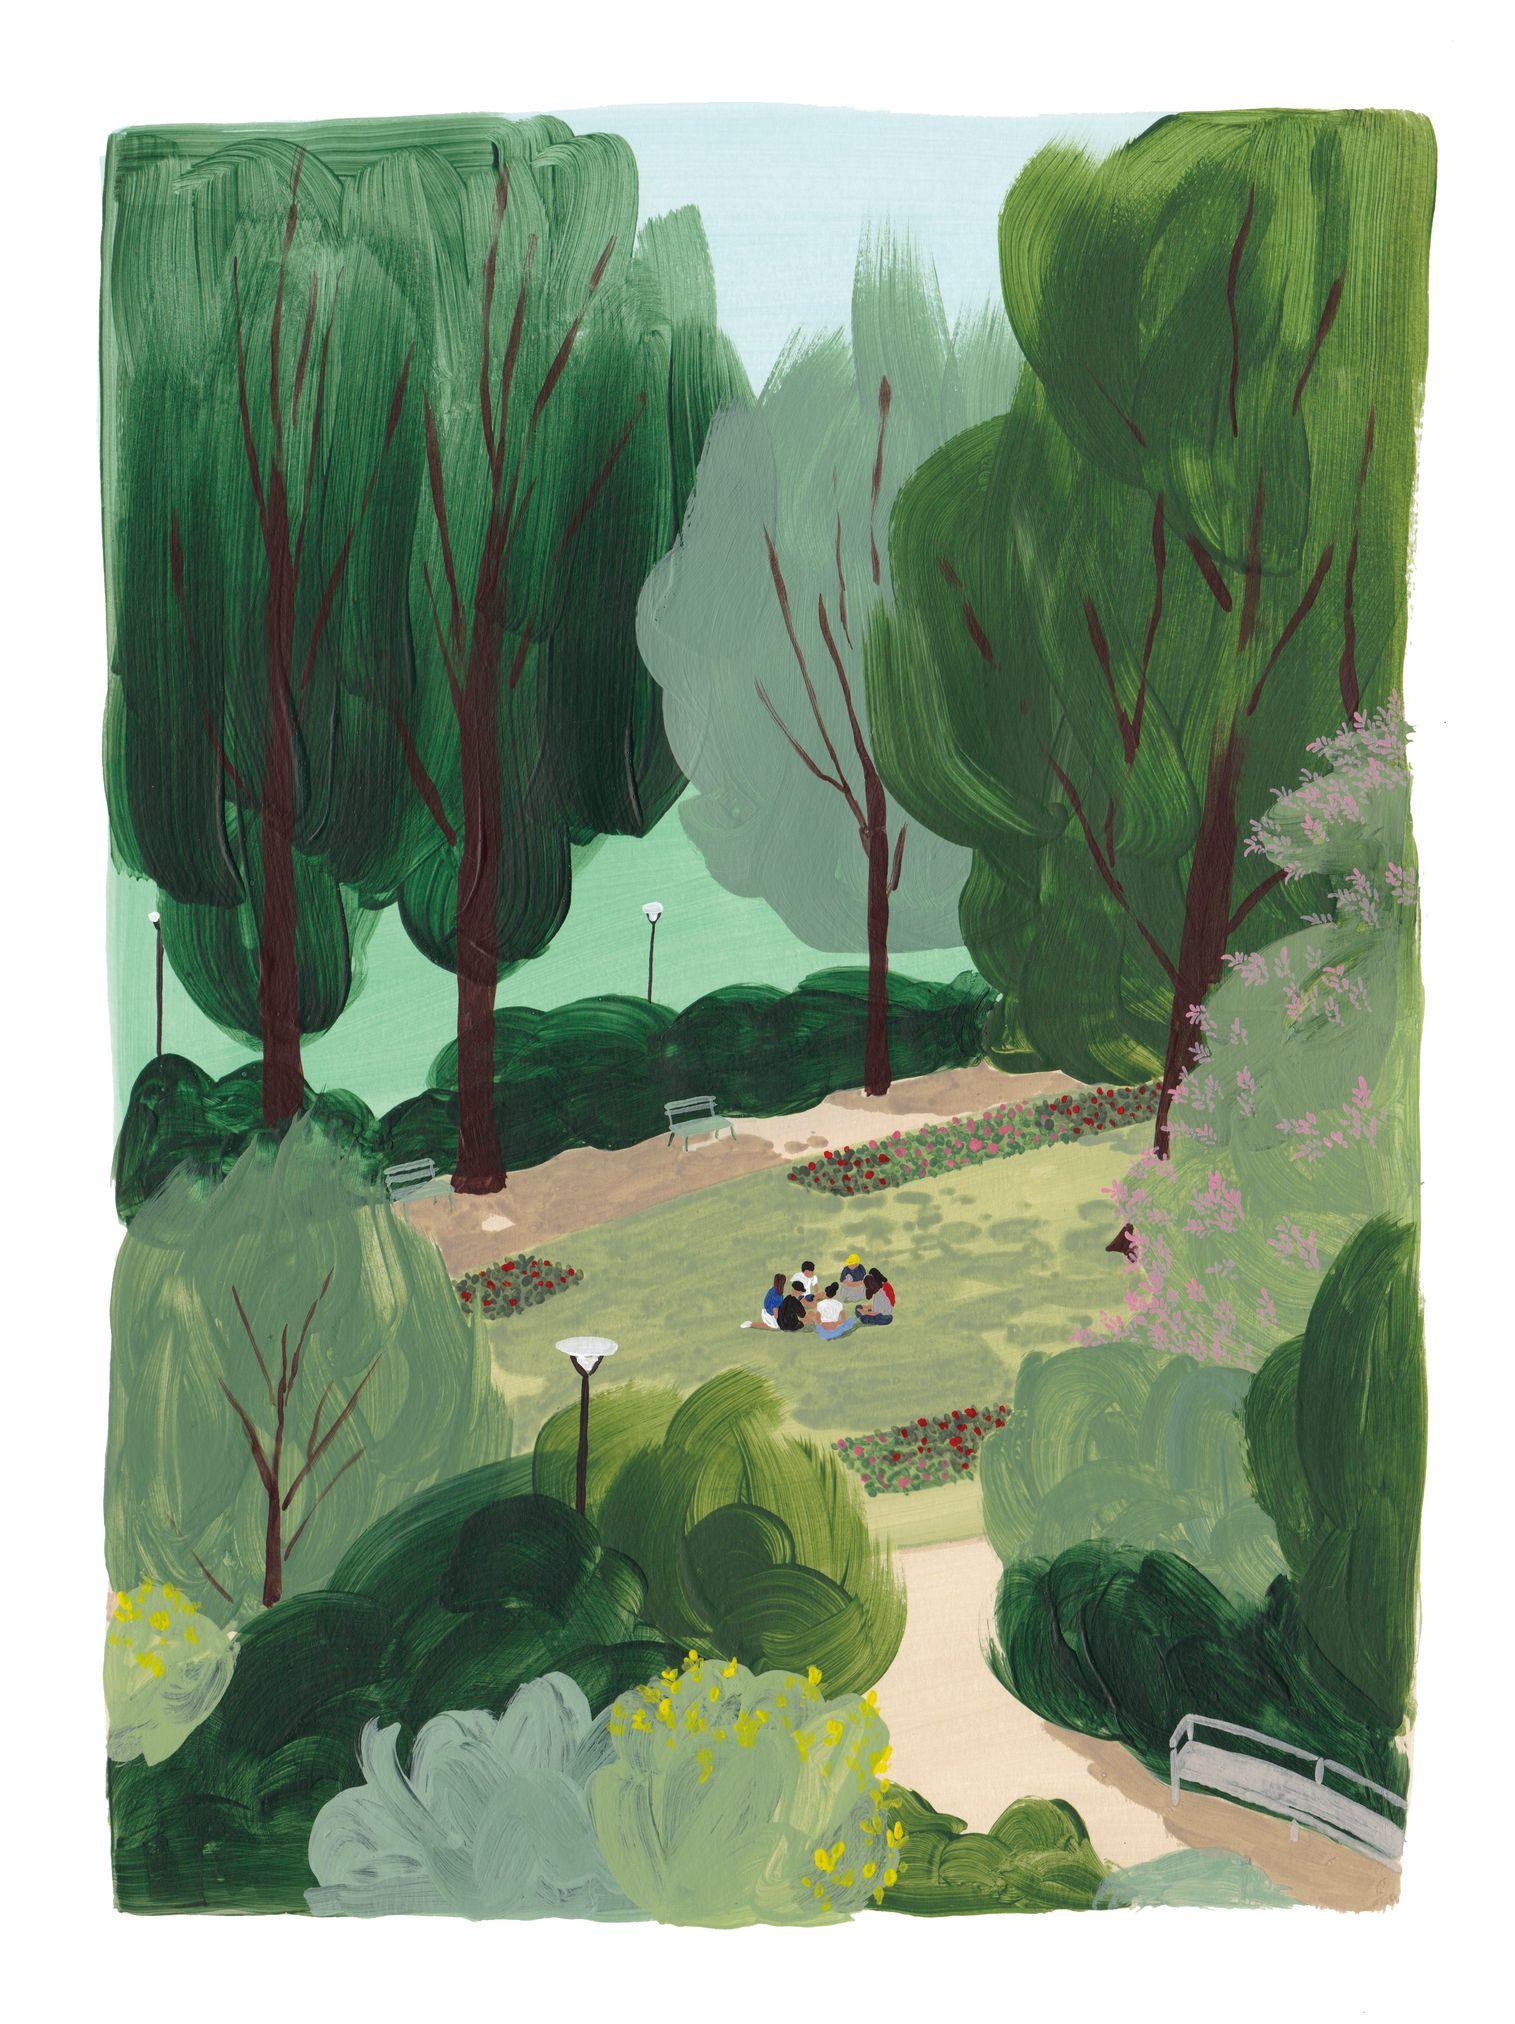 garance-illustration-Yukiko-Noritake-Projet-perso_1_Serie-de-Paris_web